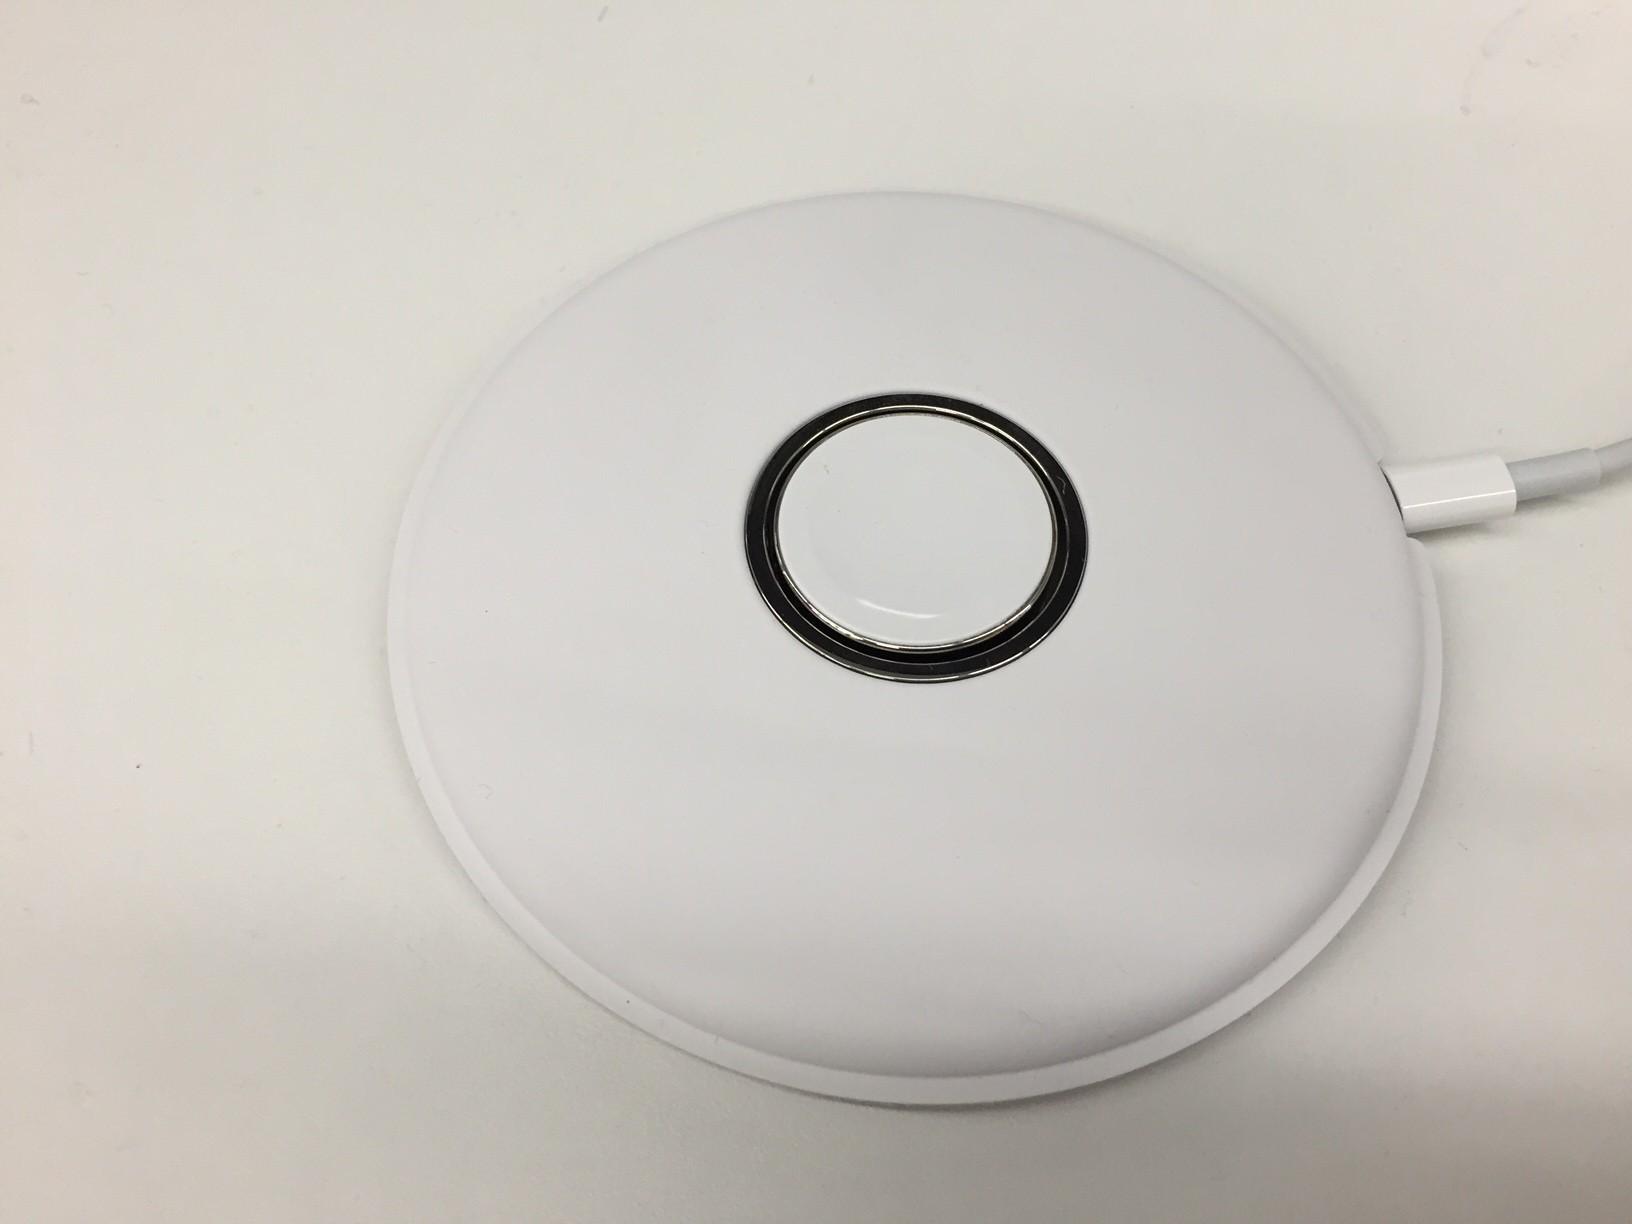 Foto do suposto Apple Magnetic Charging Dock